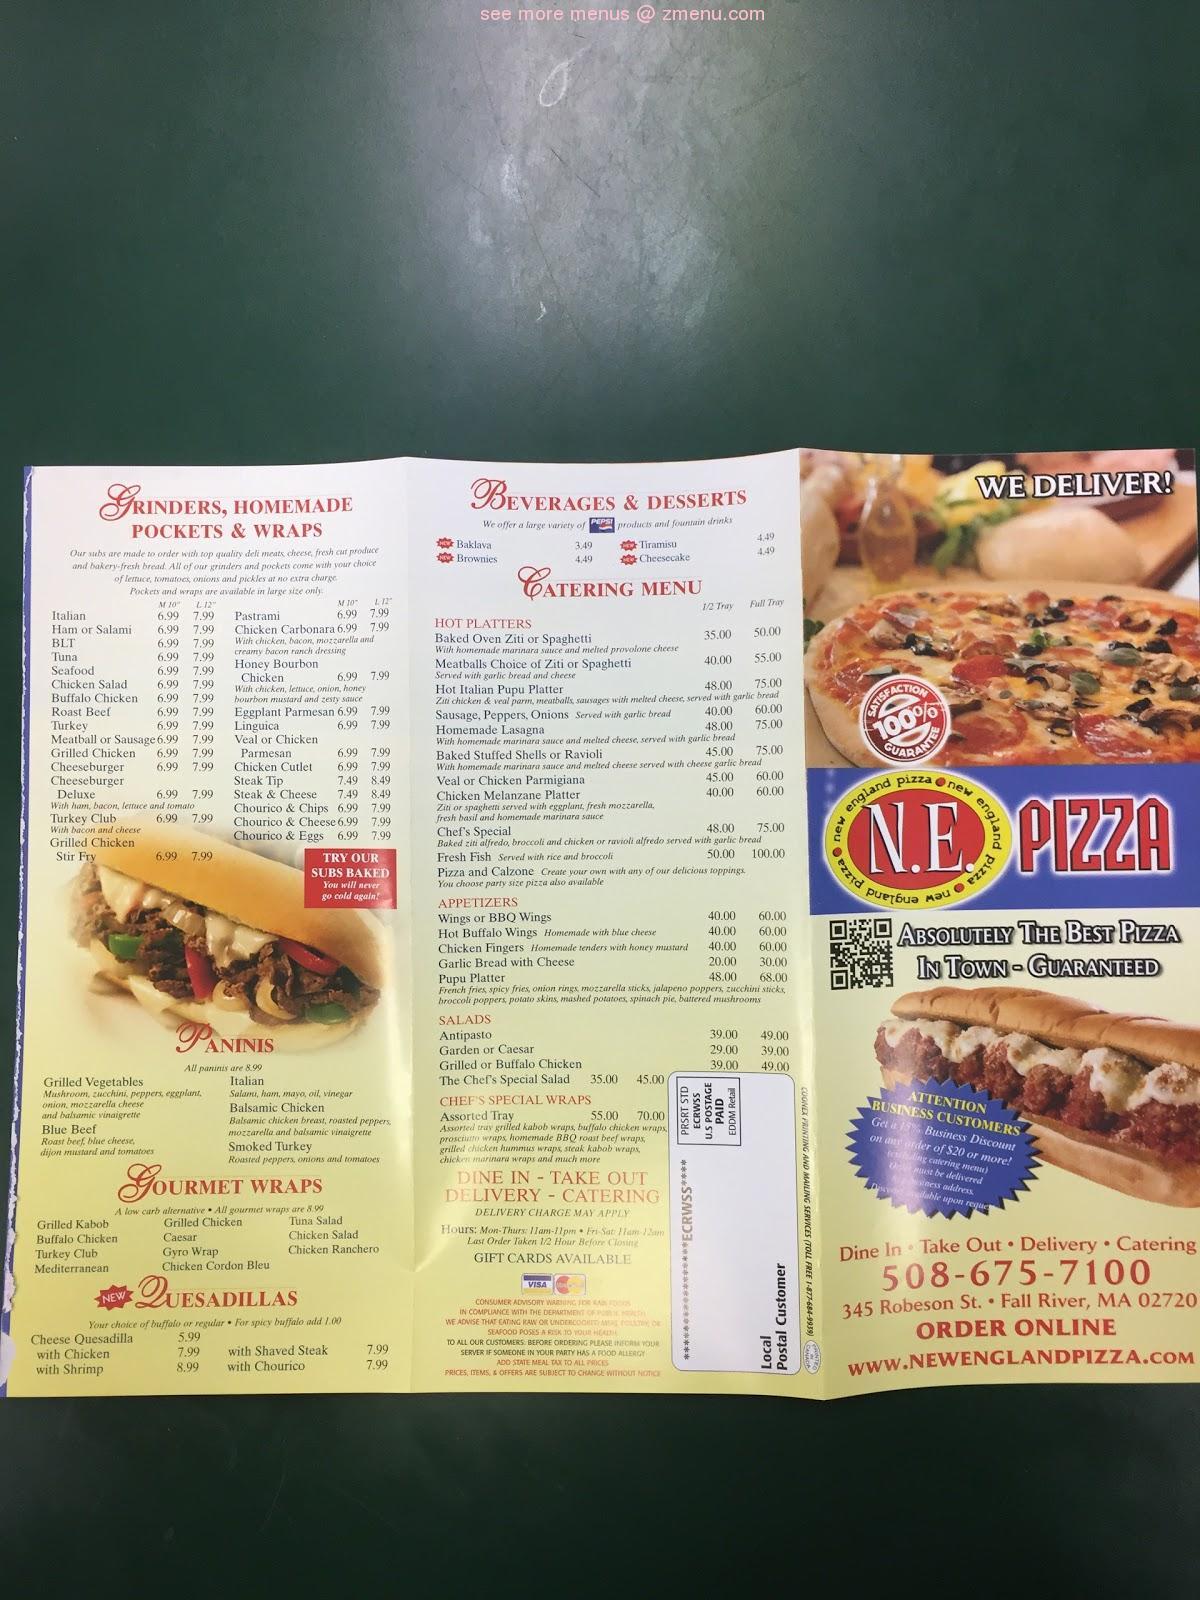 Online Menu of New England Pizza Restaurant, Fall River